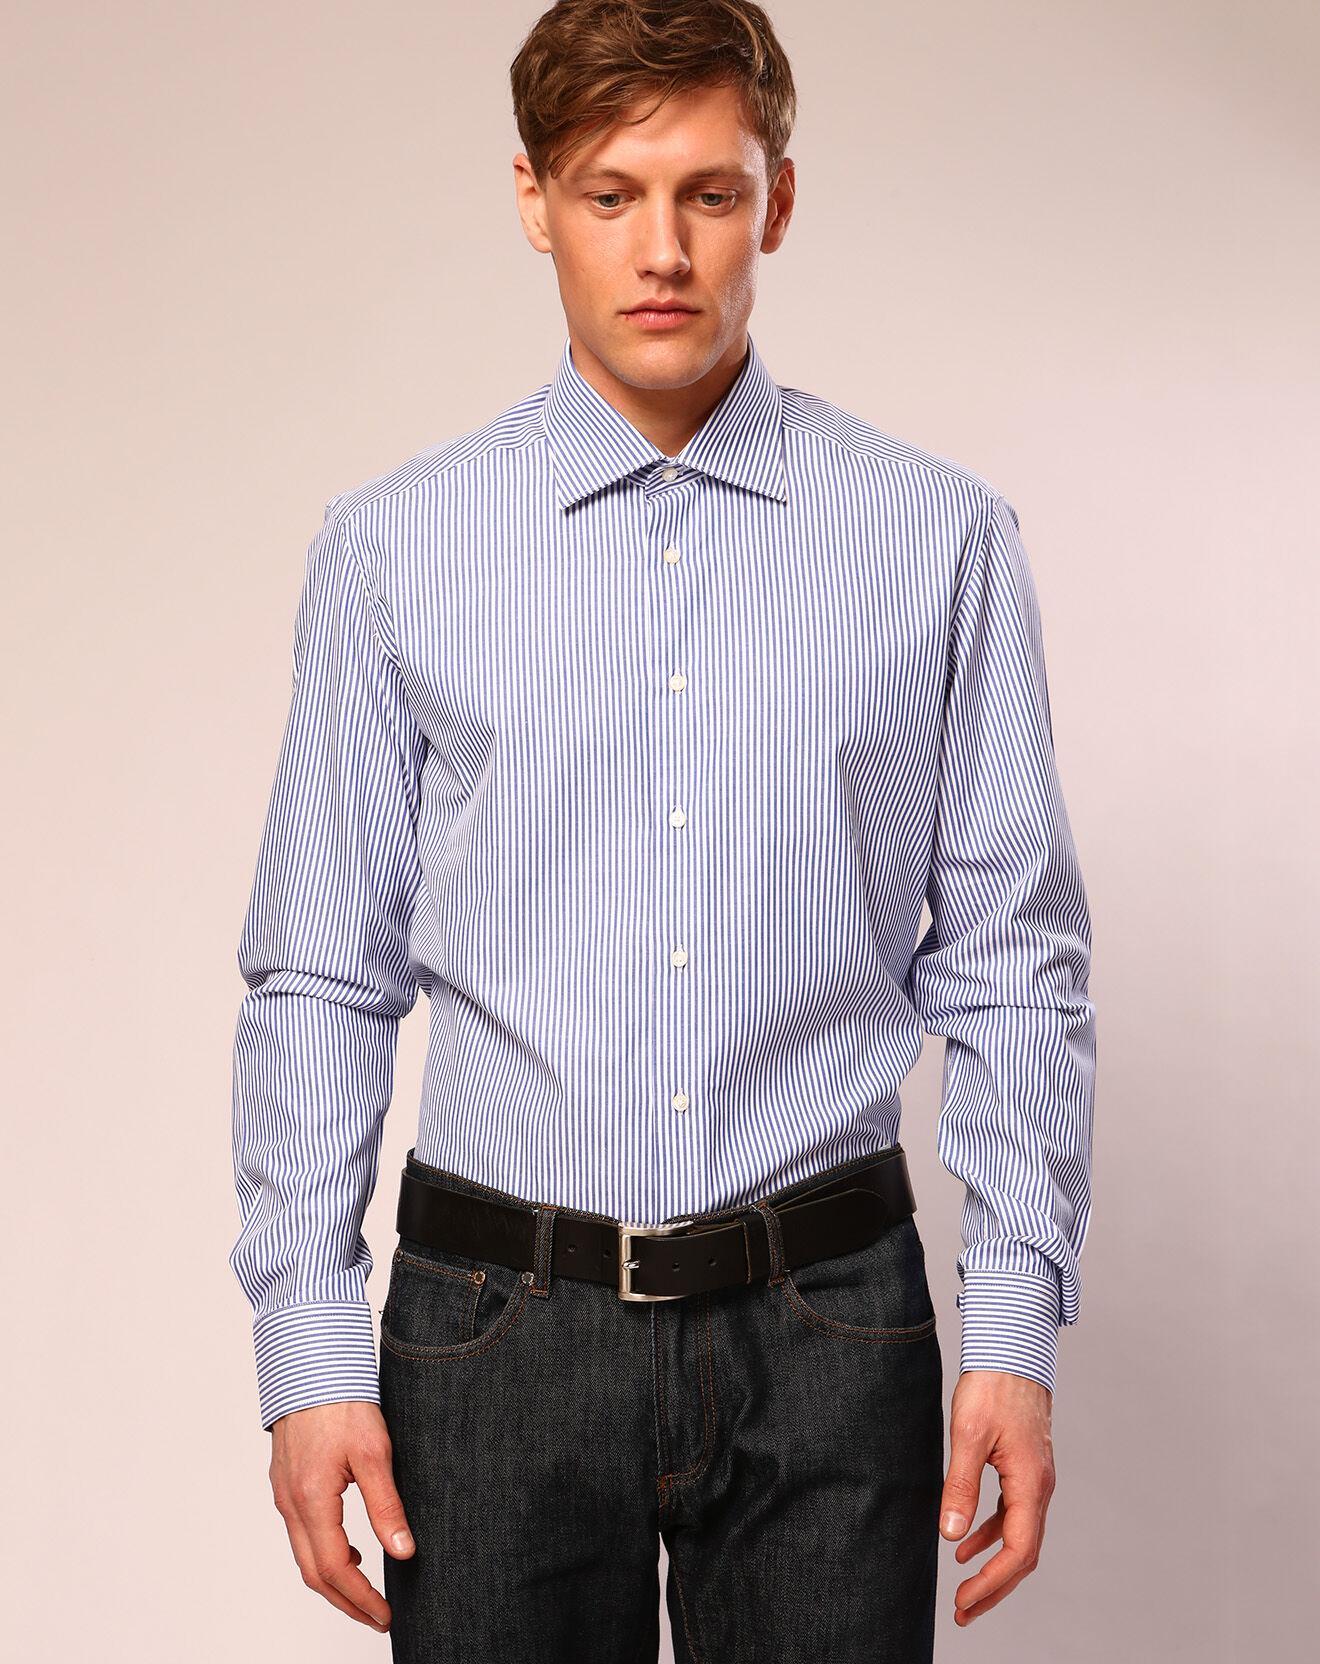 Chemise ajustée rayée Audran bleu/blanc